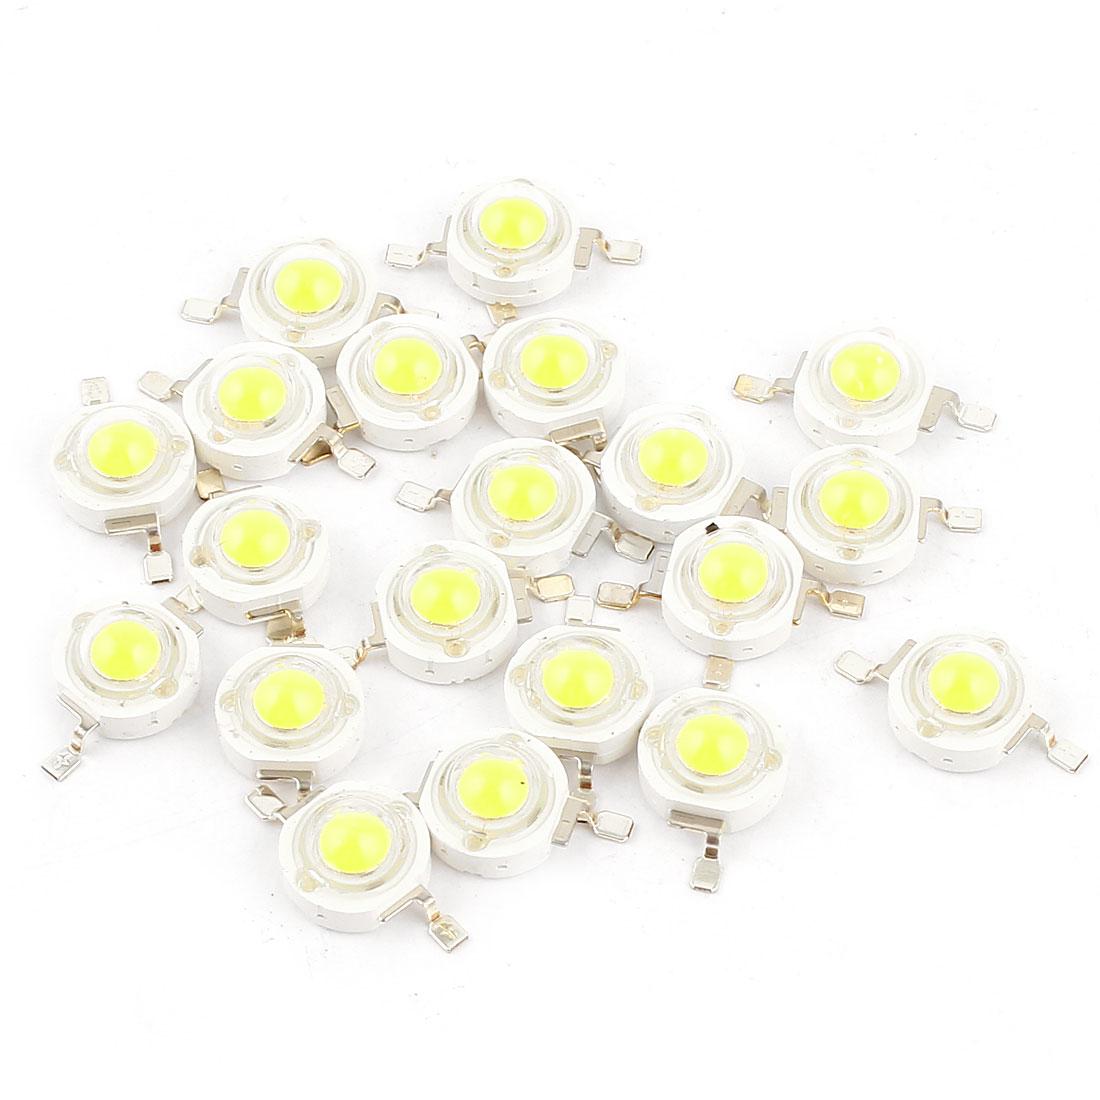 20 Pcs Pure White Light SMD LED Bead Chip Bulb Lamp 3.0-3.6V 350mA 1W 90LM